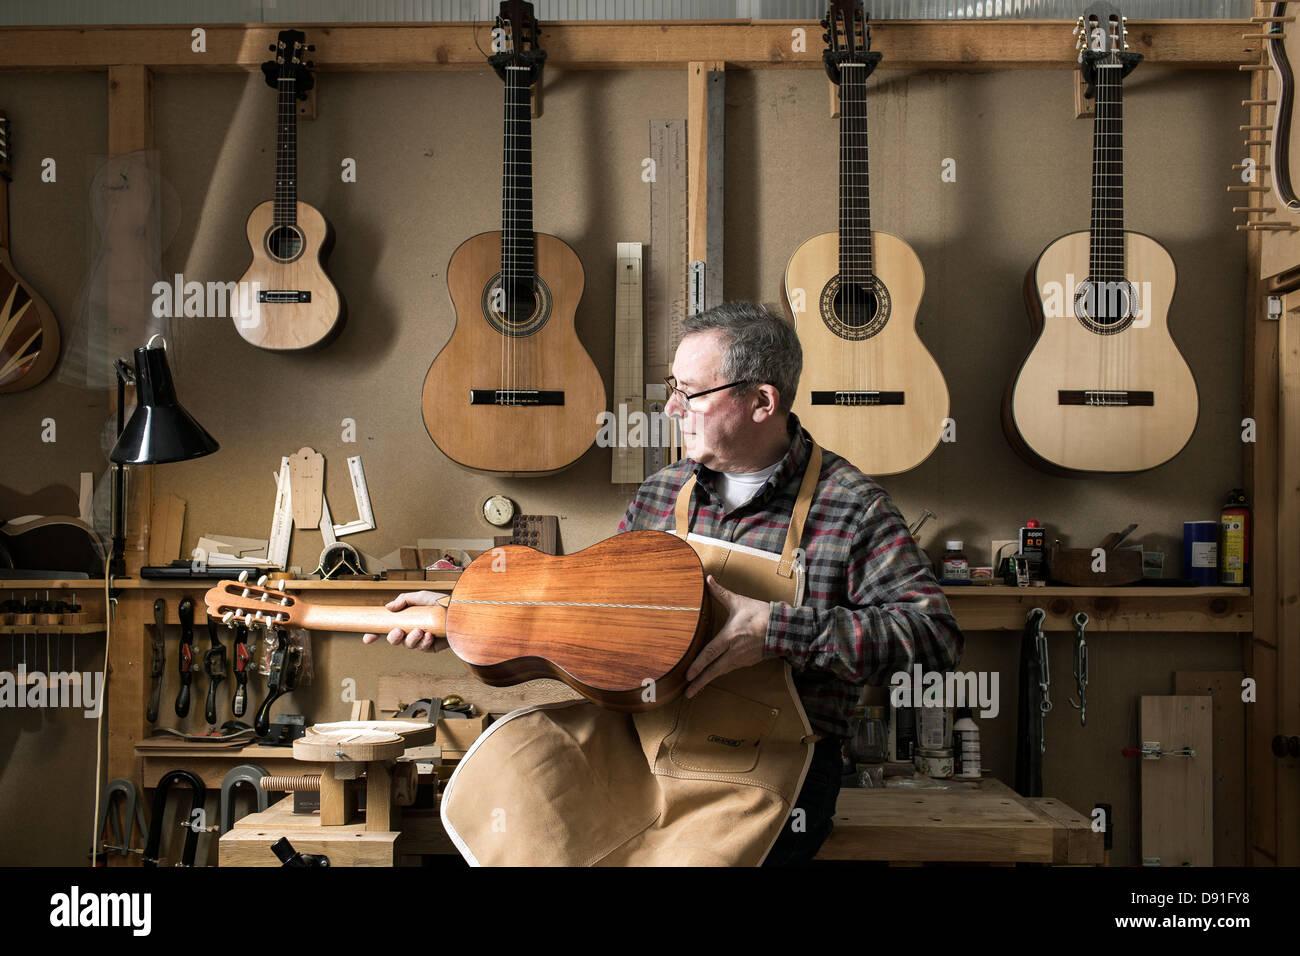 Liutaio finitura chitarra acustica in officina Immagini Stock